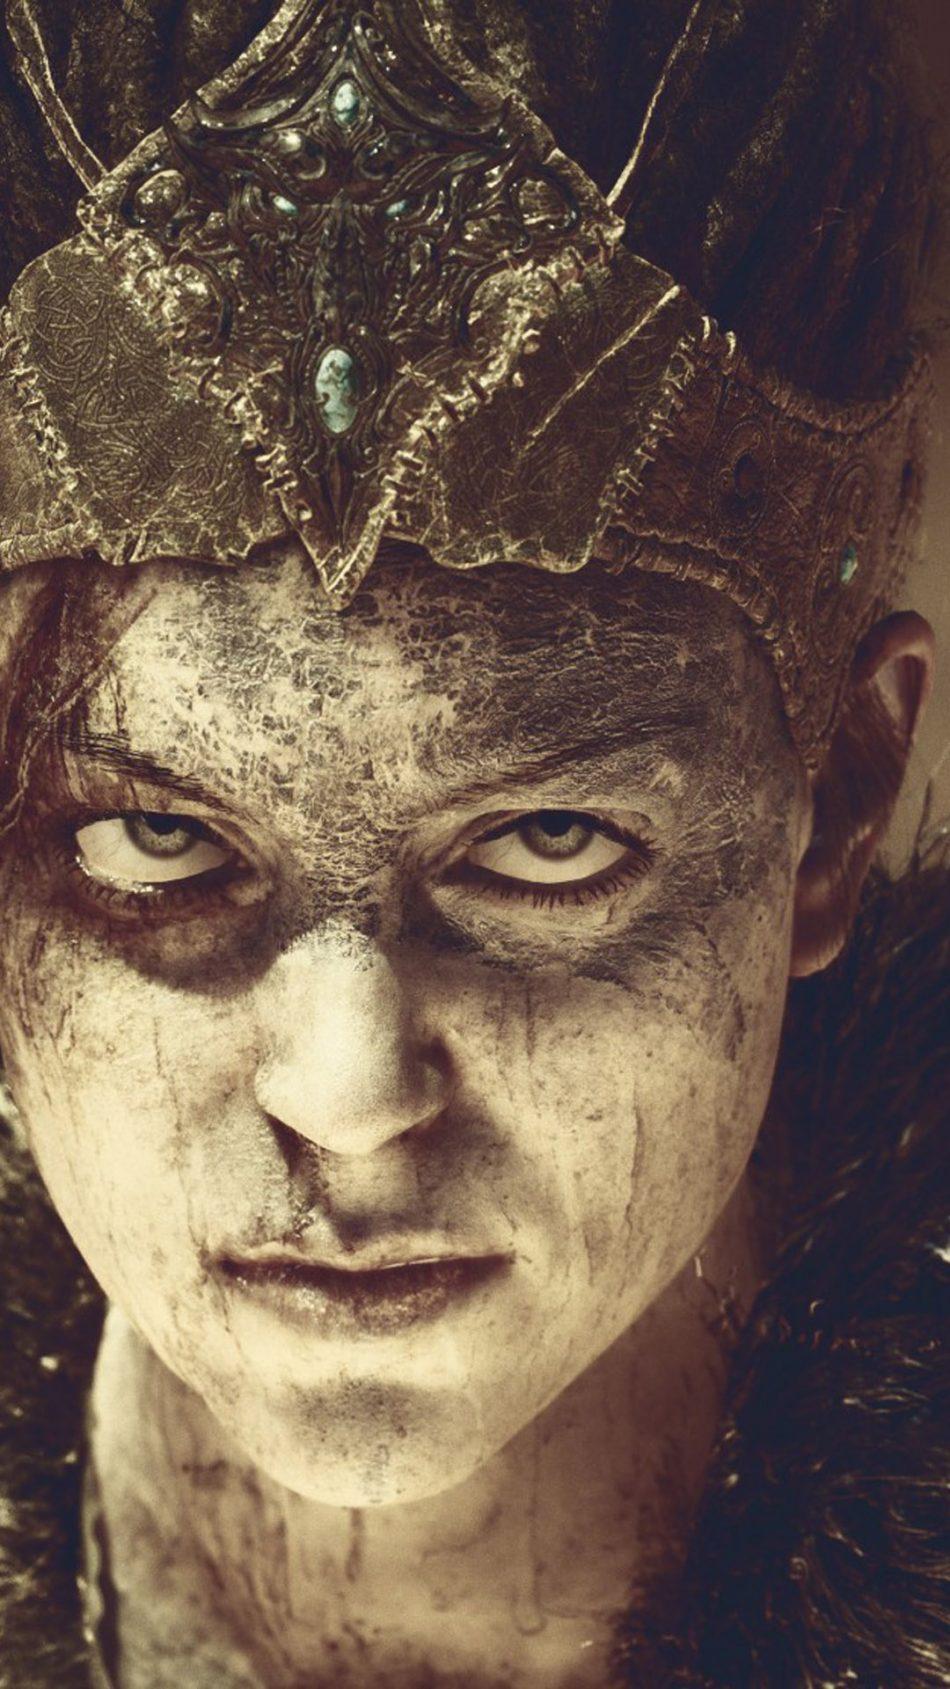 Download Hellblade Senuas Sacrifice Free Pure 4k Ultra Hd